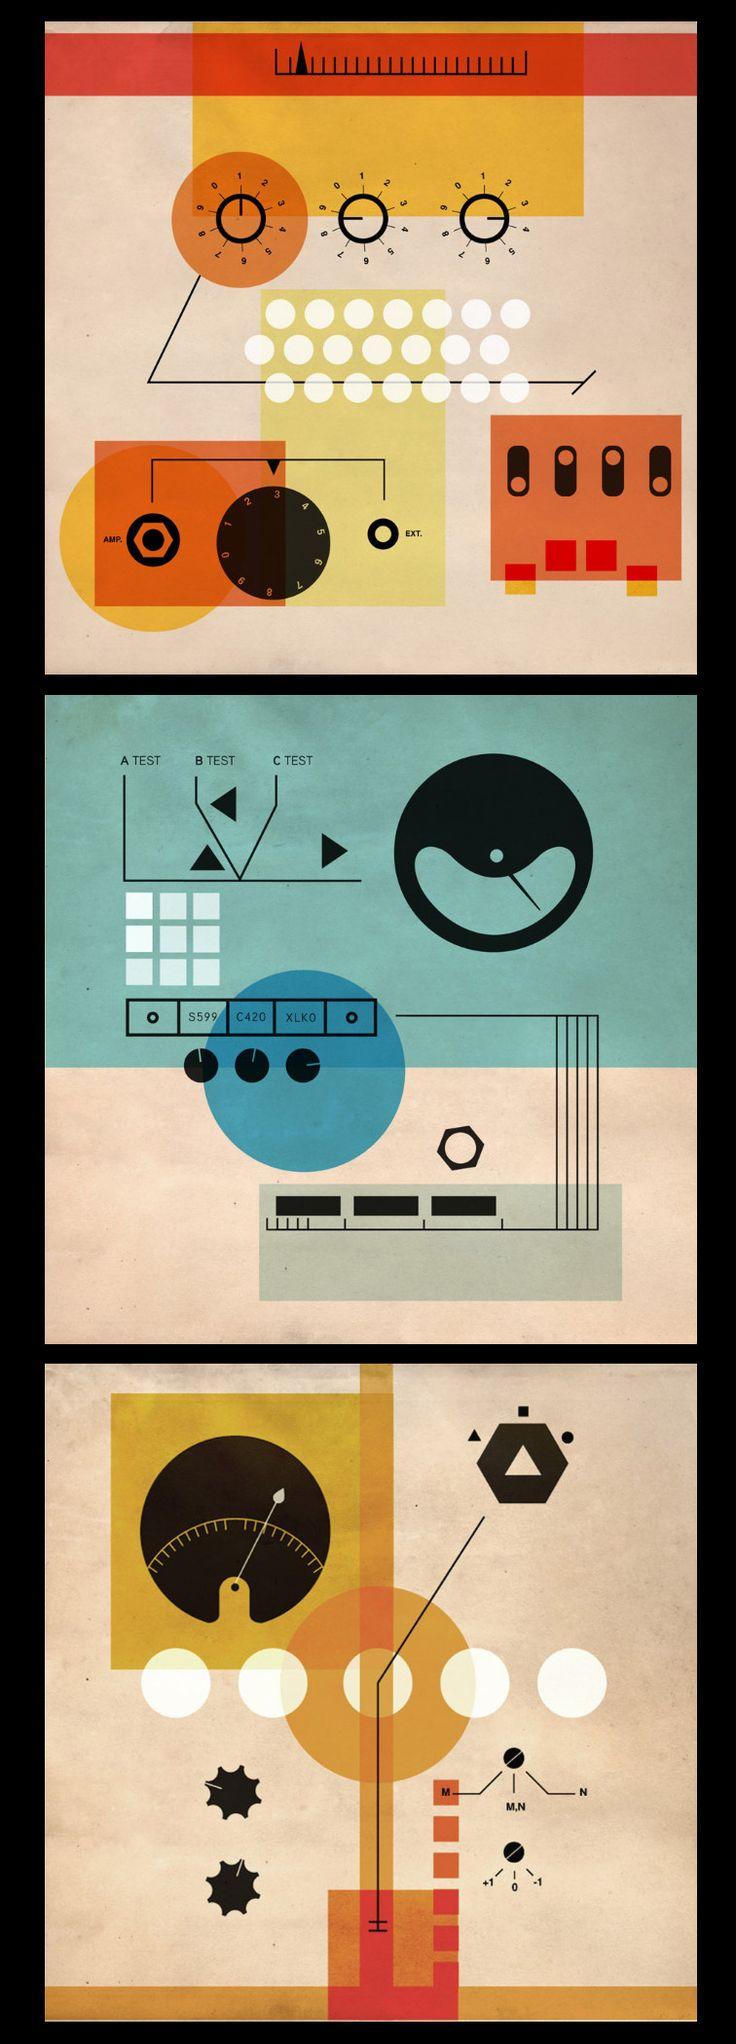 Analog Controls by Chad Hagen